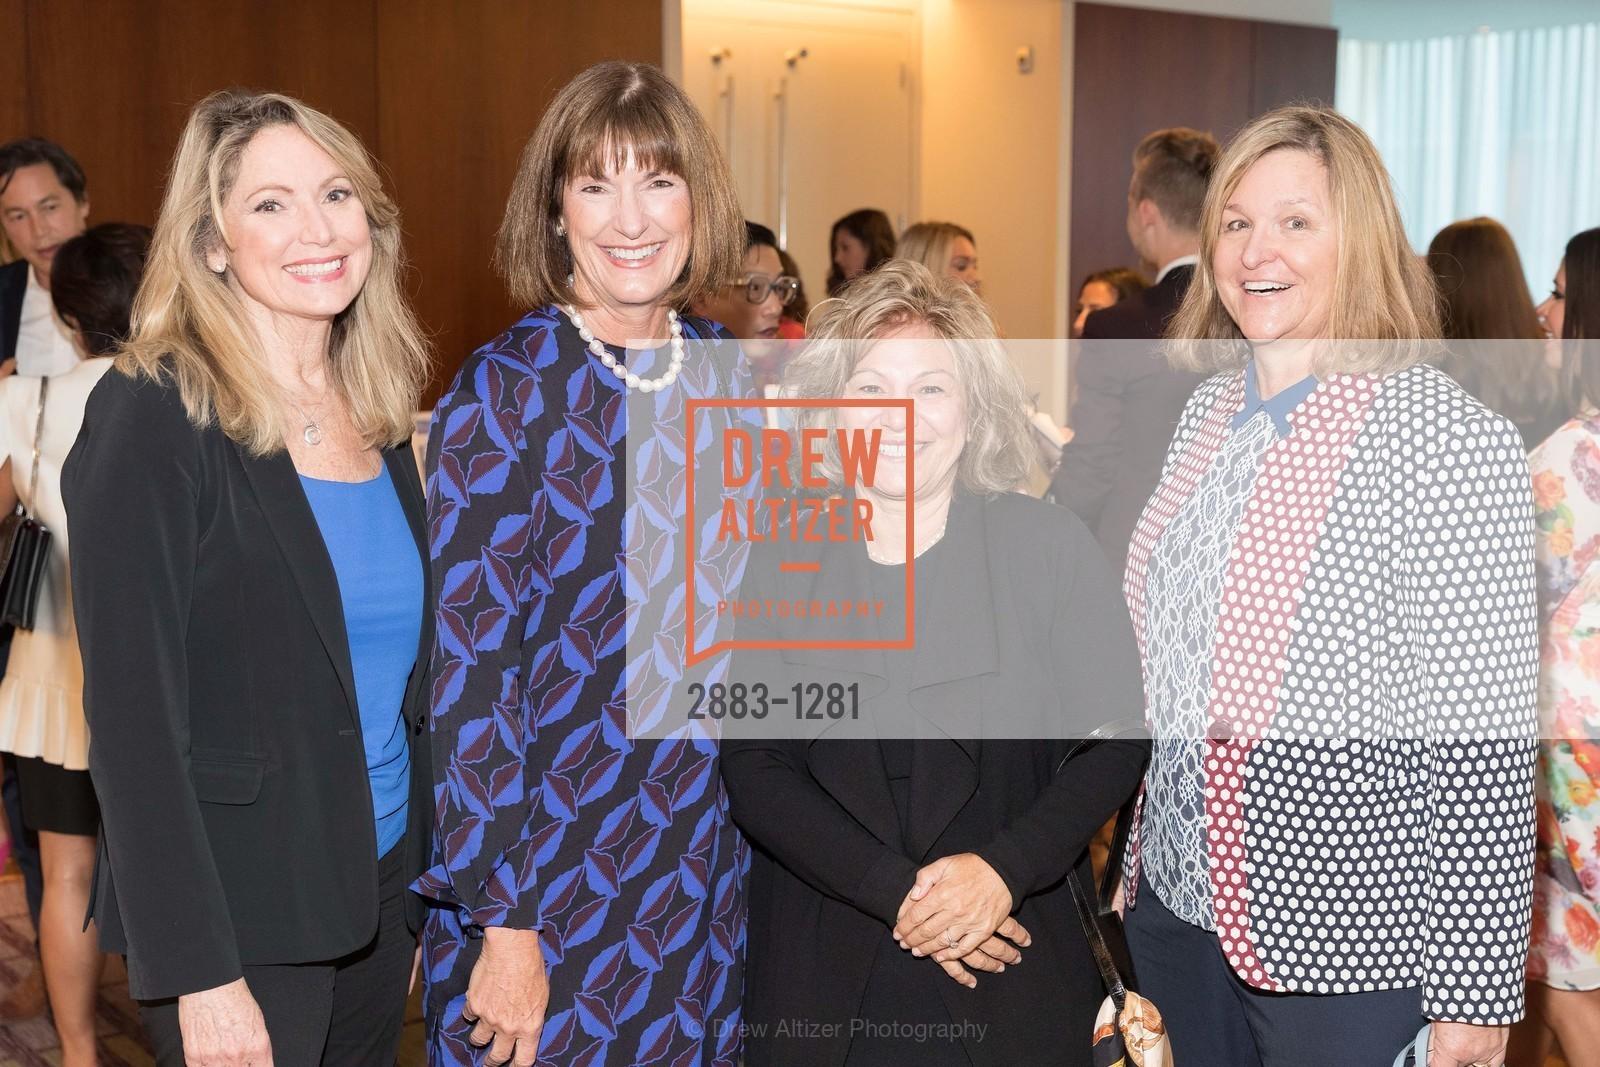 Kimberly Enright, Carolyn Wente, Paula Ametjian, Emily Tashman, Dress for Success 11th Annual Gala, US. Intercontinental Hotel, June 22nd, 2016